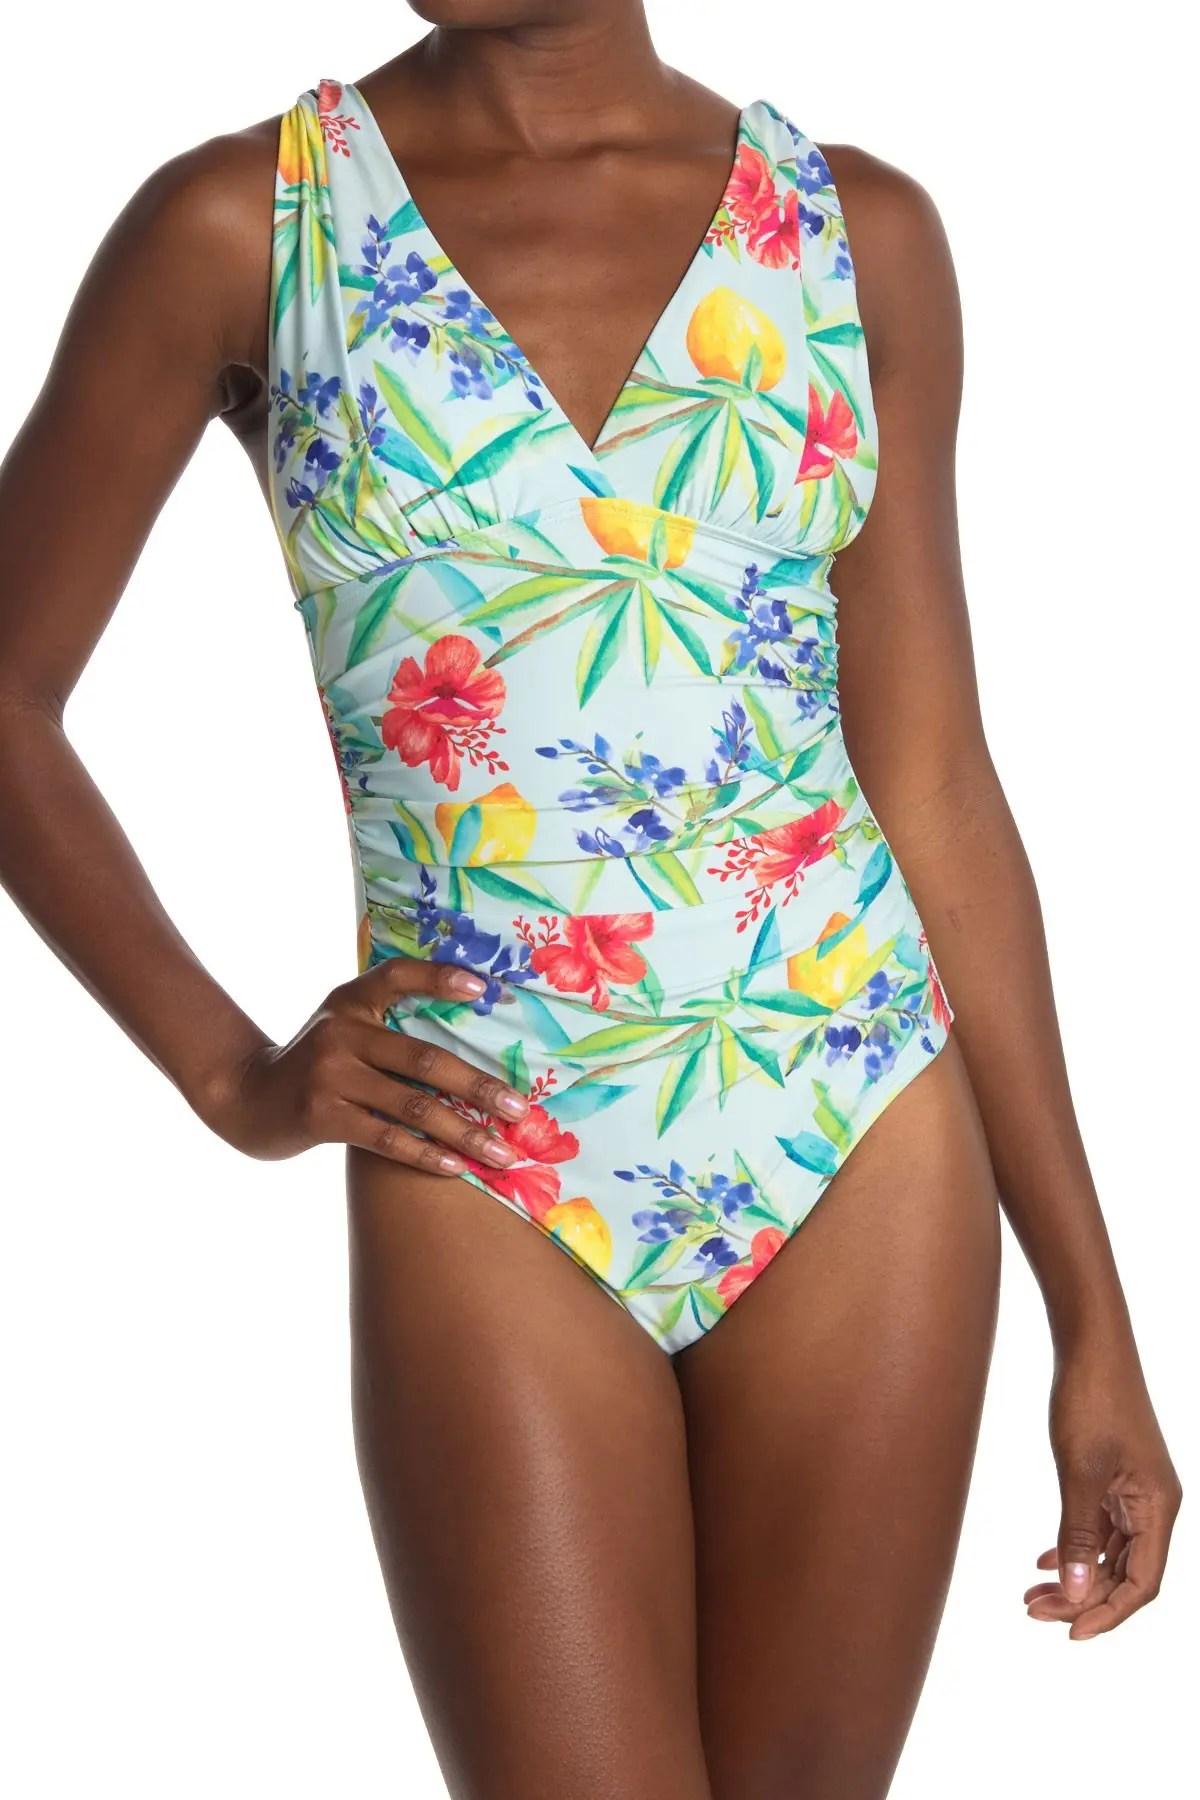 athena simple pleasures one piece swimsuit nordstrom rack